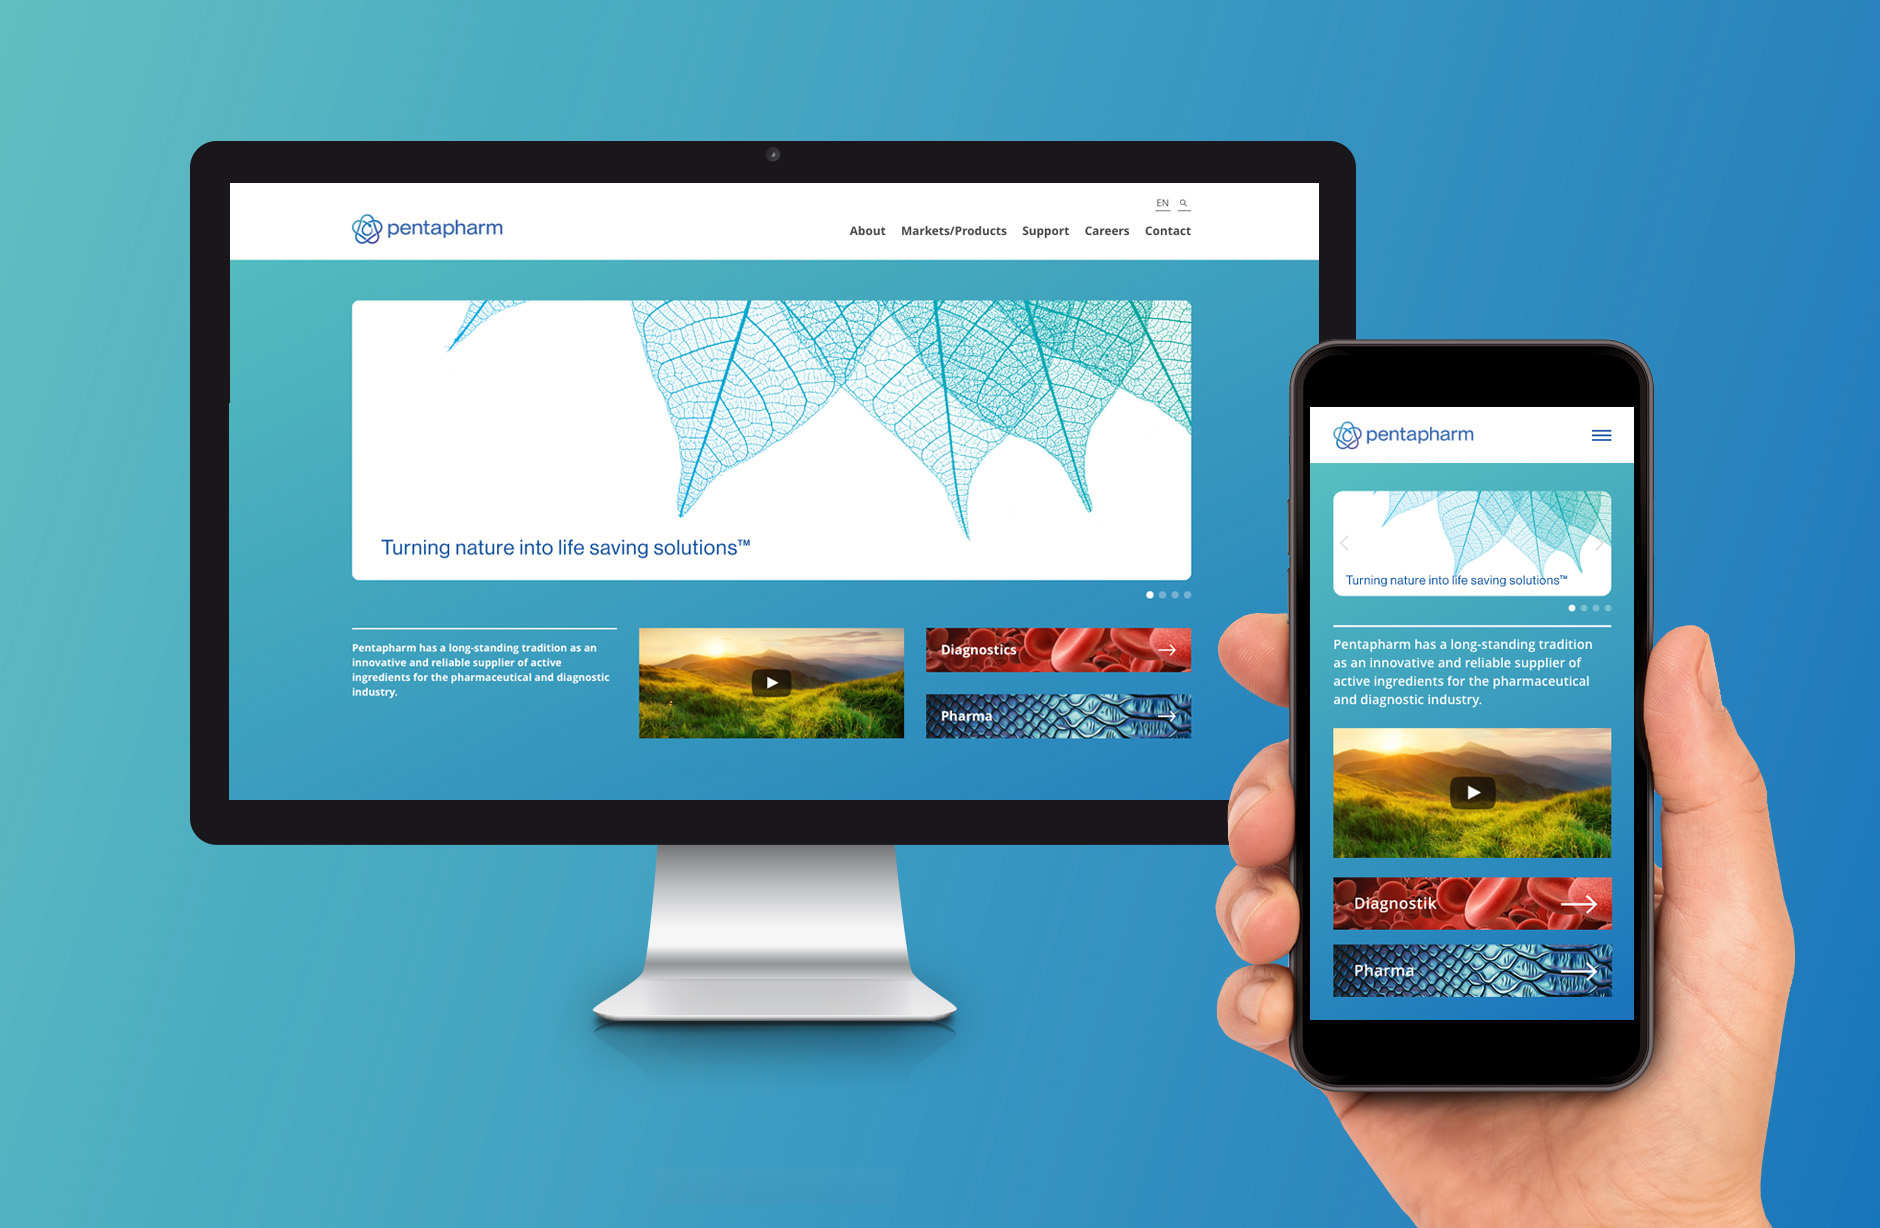 Pentahparm Webseite